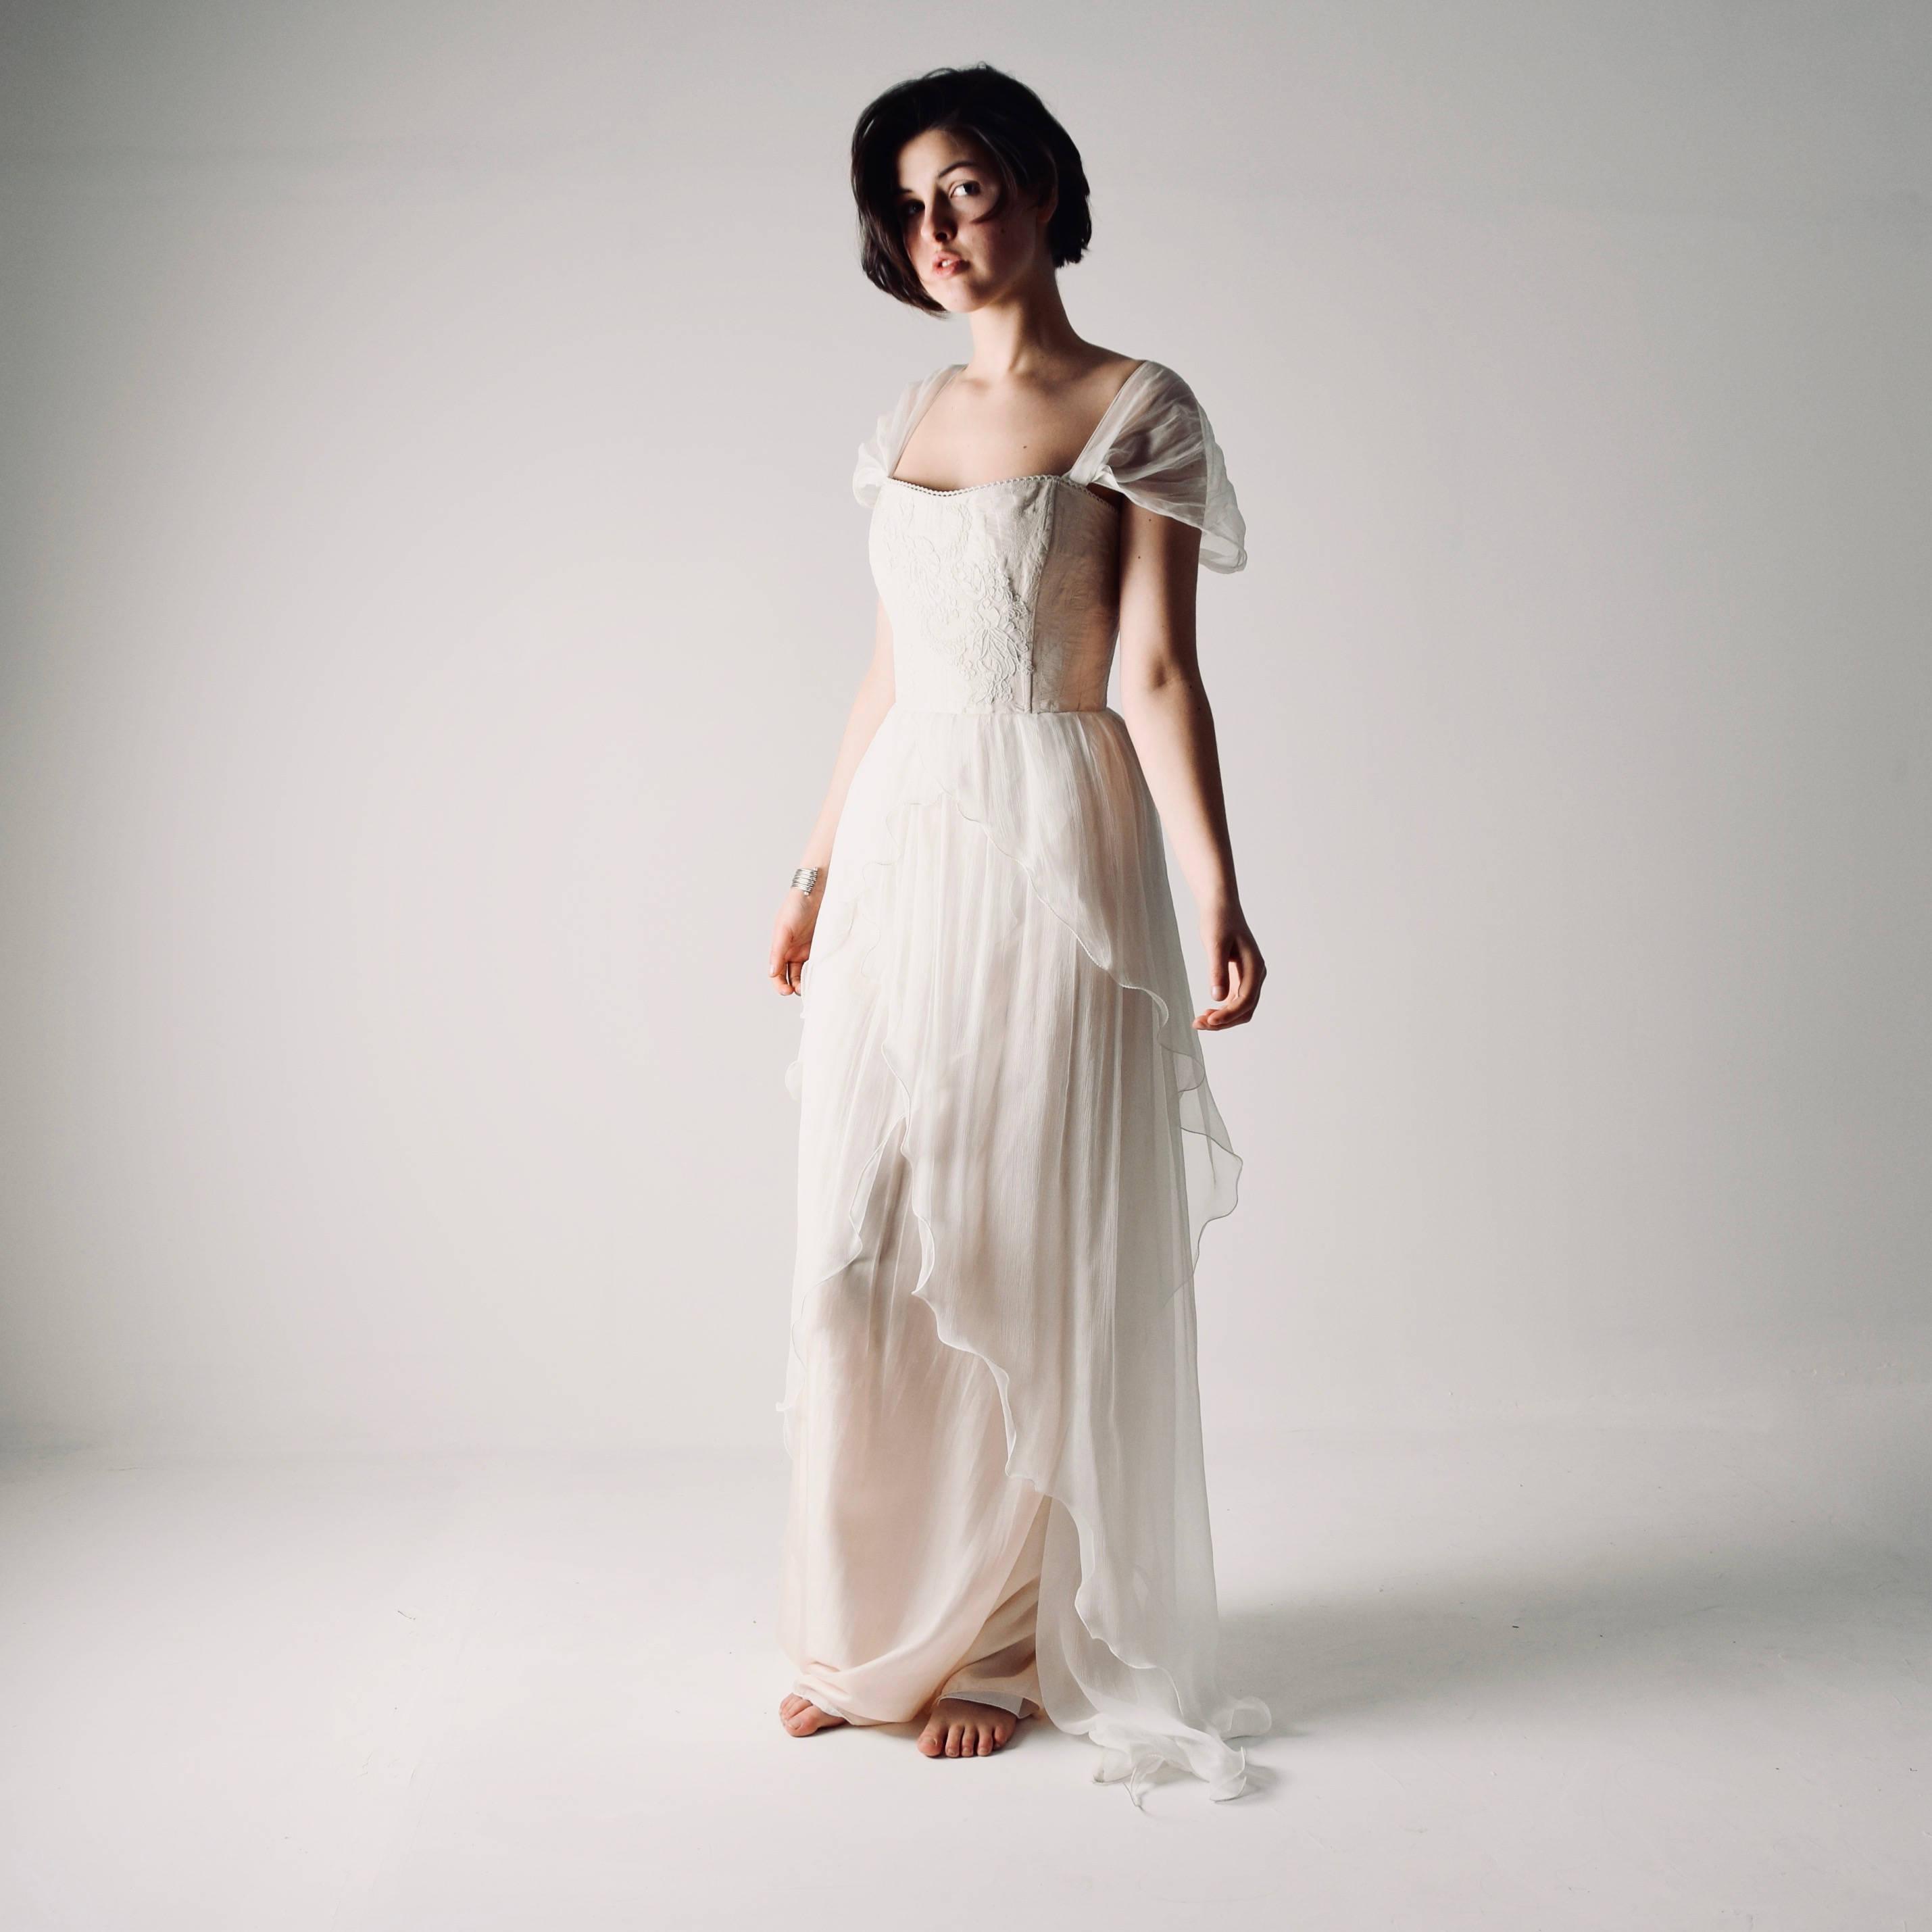 Anthericum ~ Layered Chiffon Wedding Dress - Larimeloom